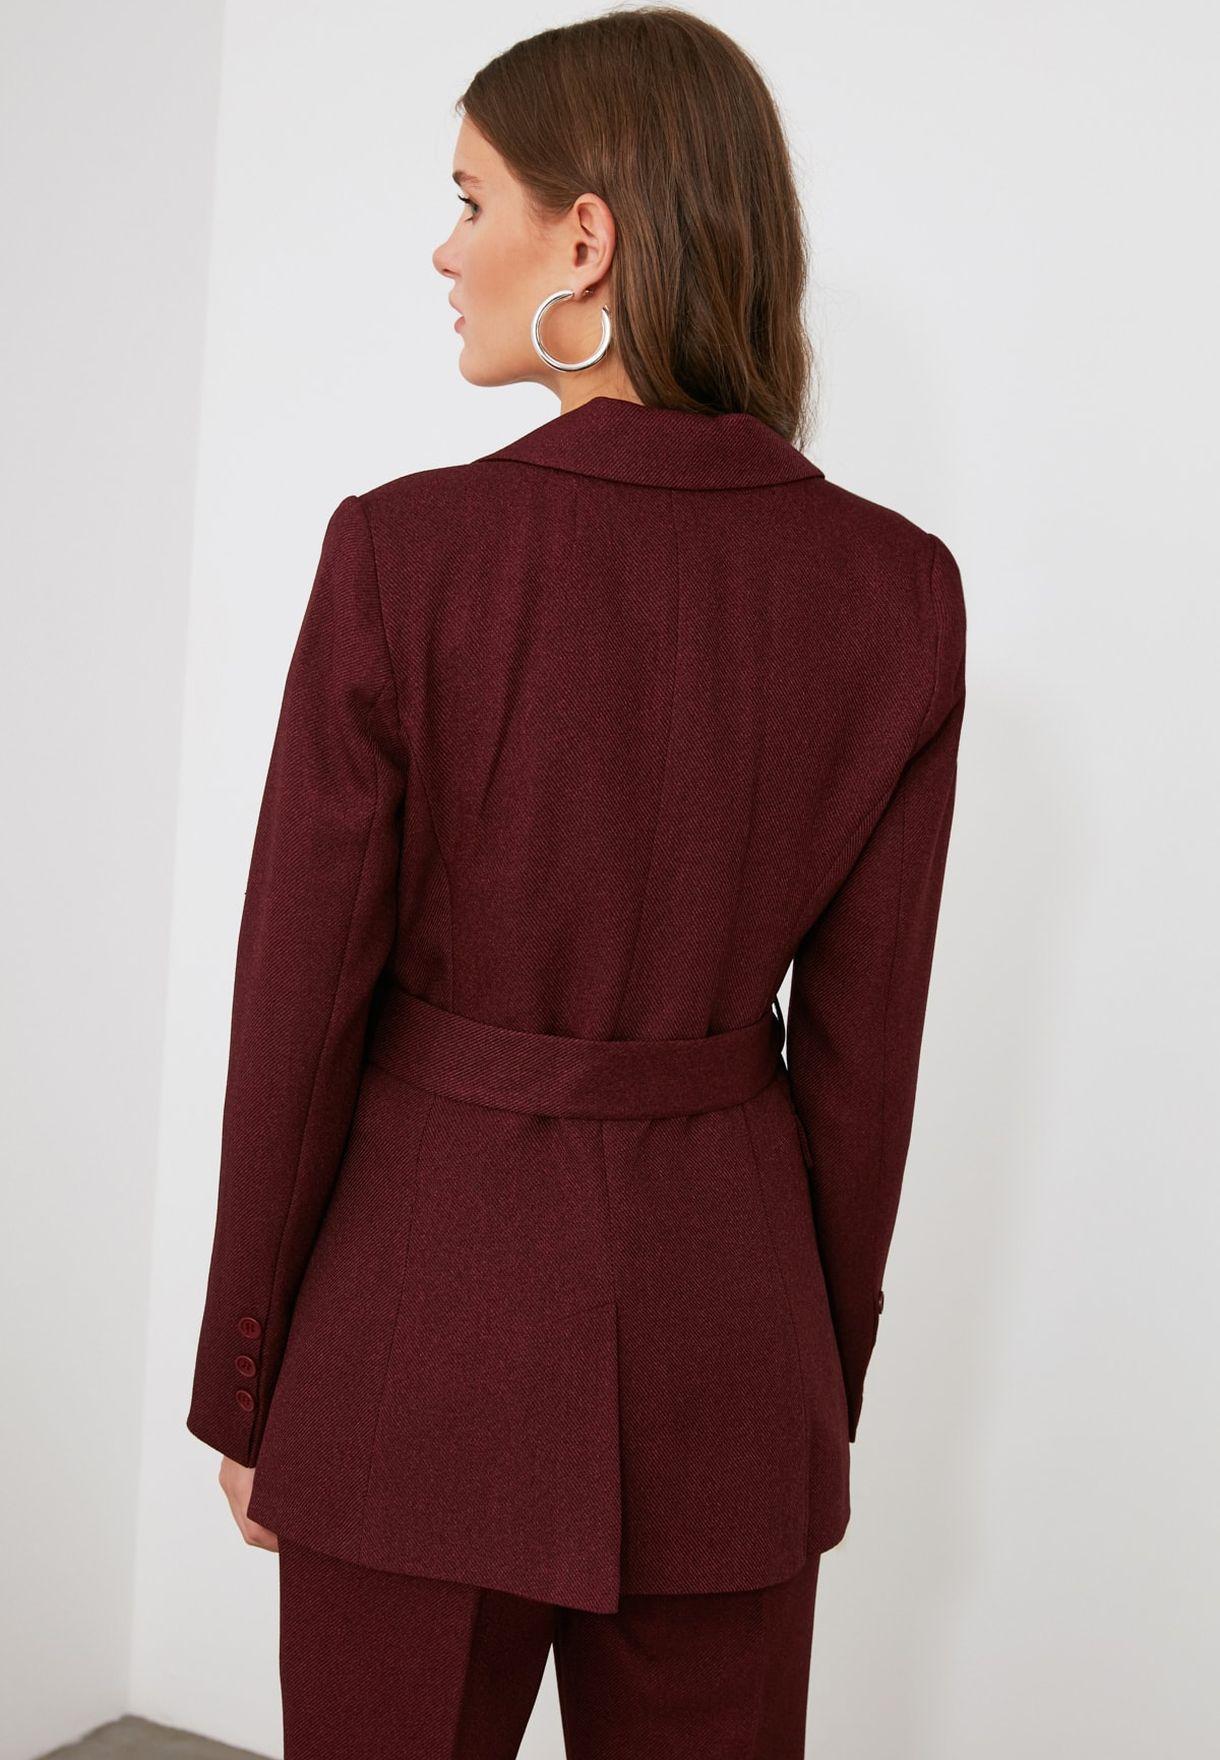 Pocket Detail Blazer